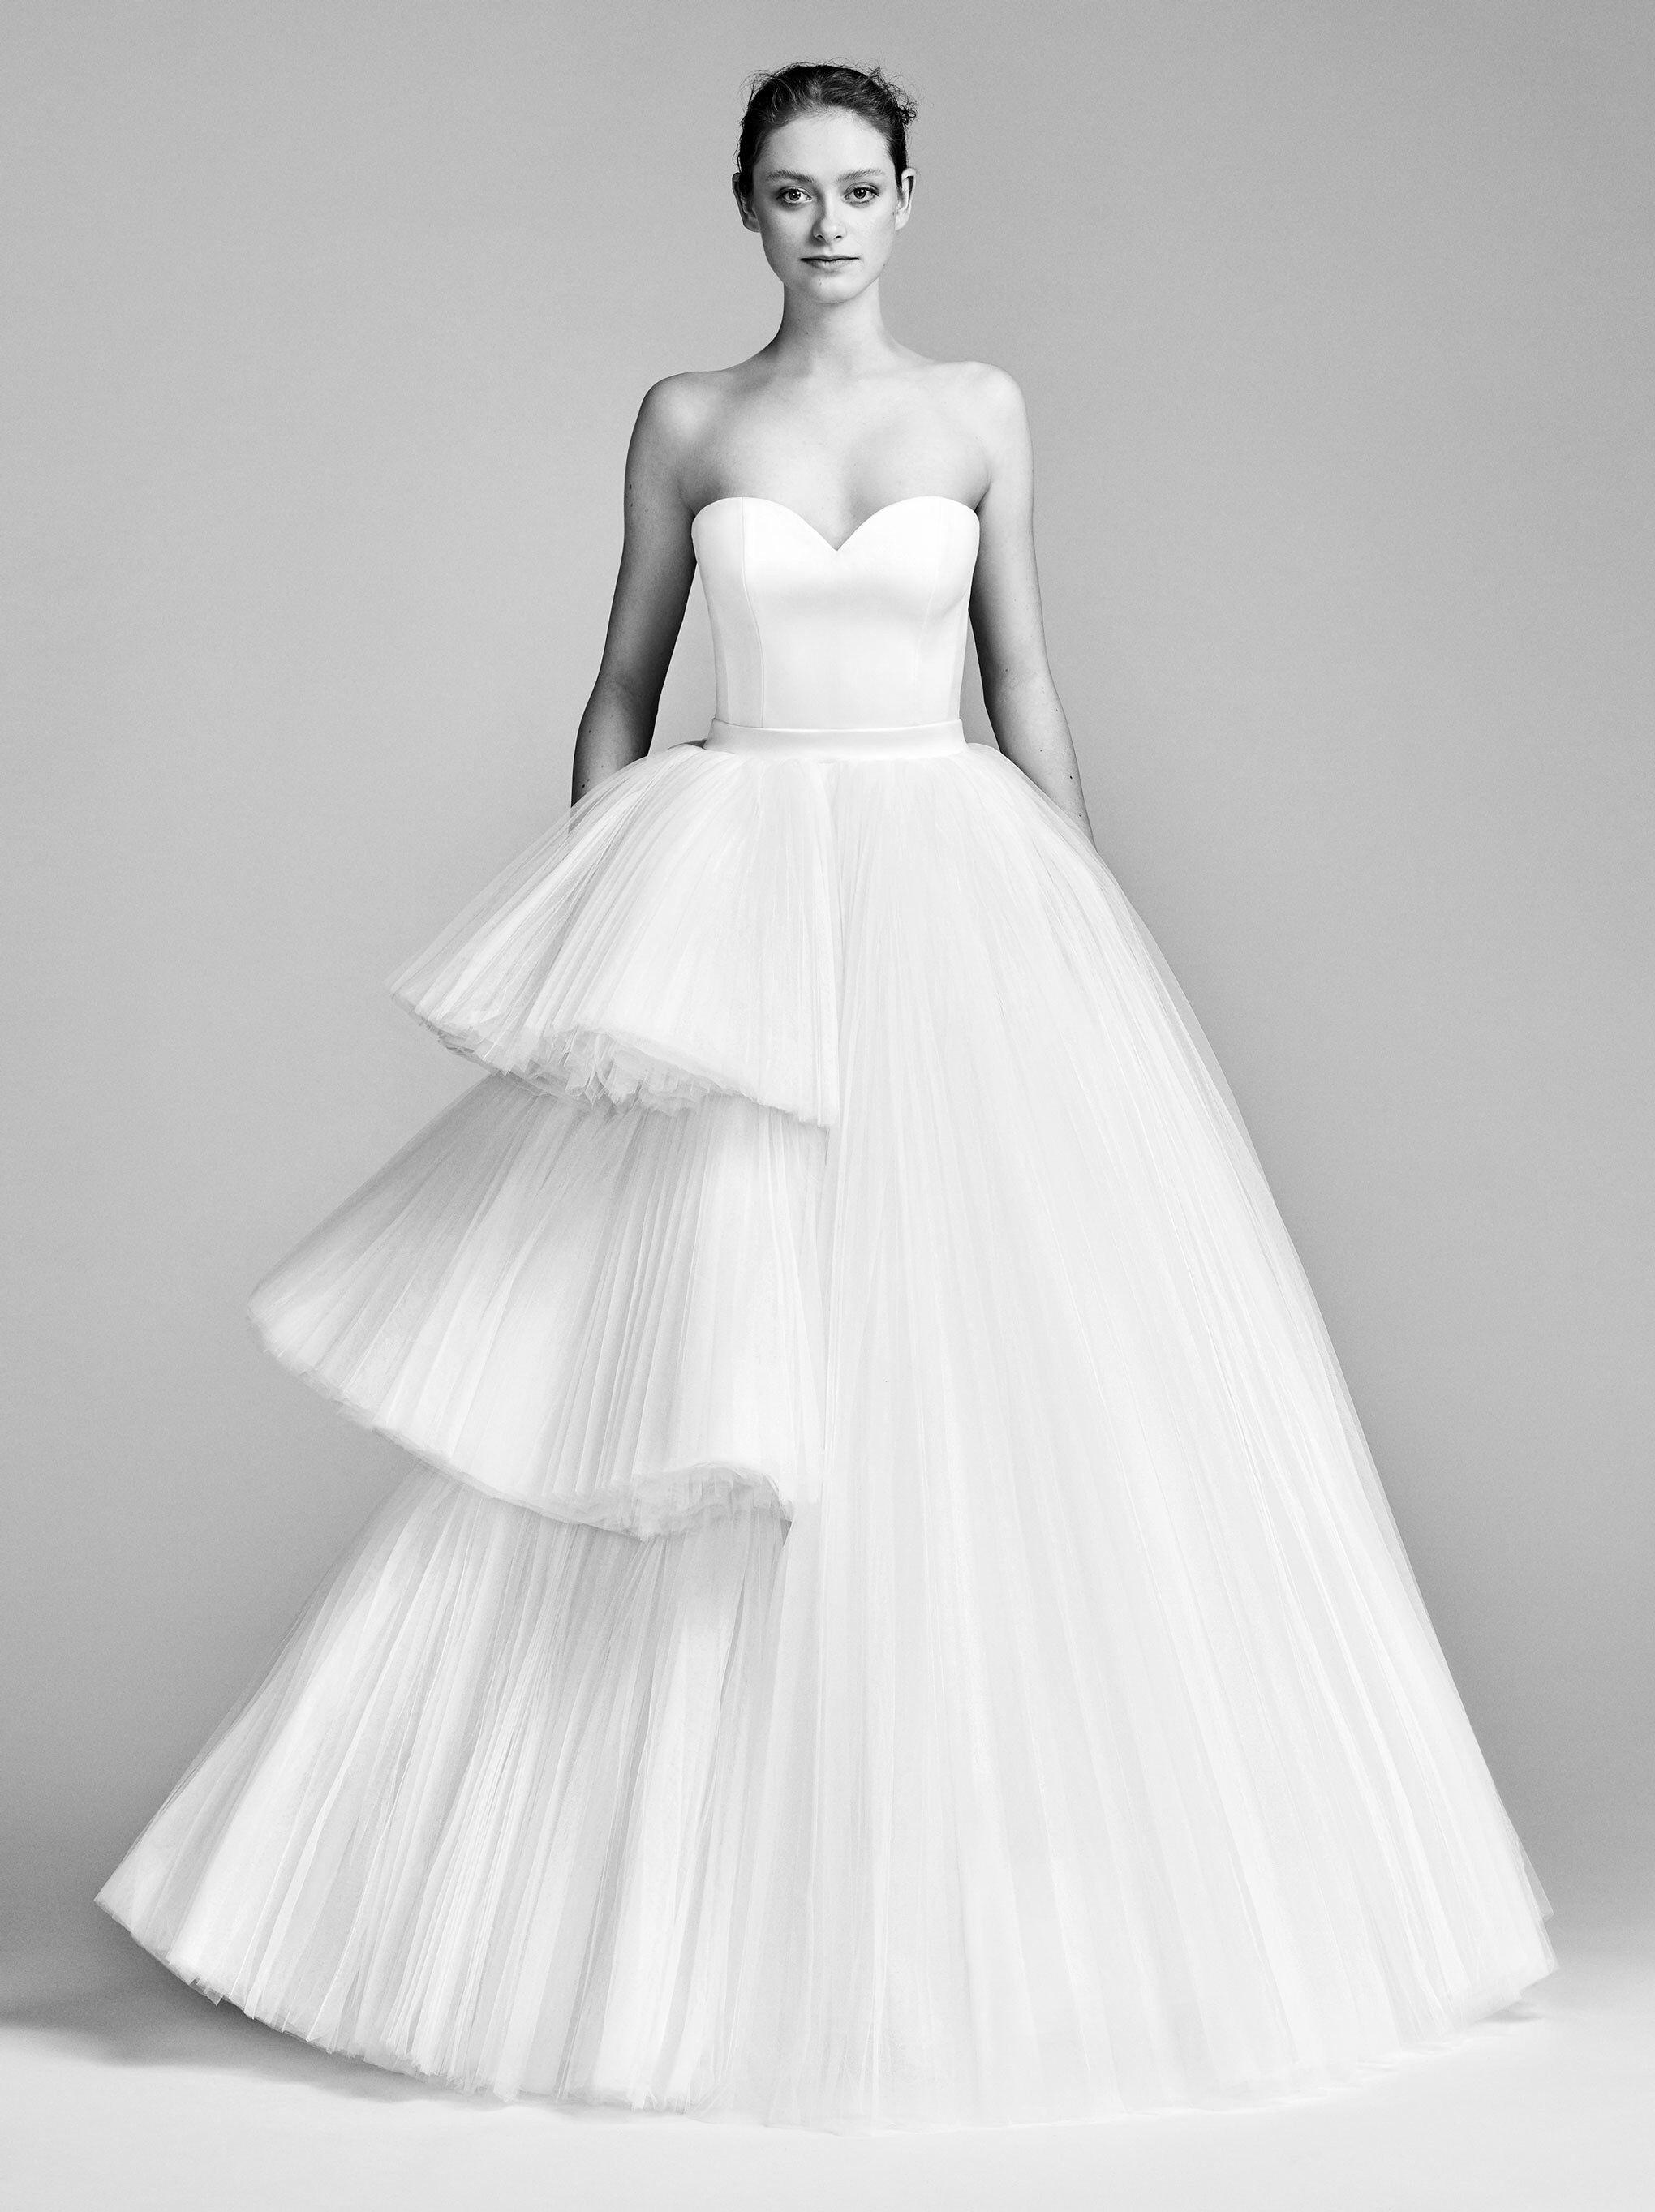 Viktor u rolf bridal spring fashion show spring skirts and style